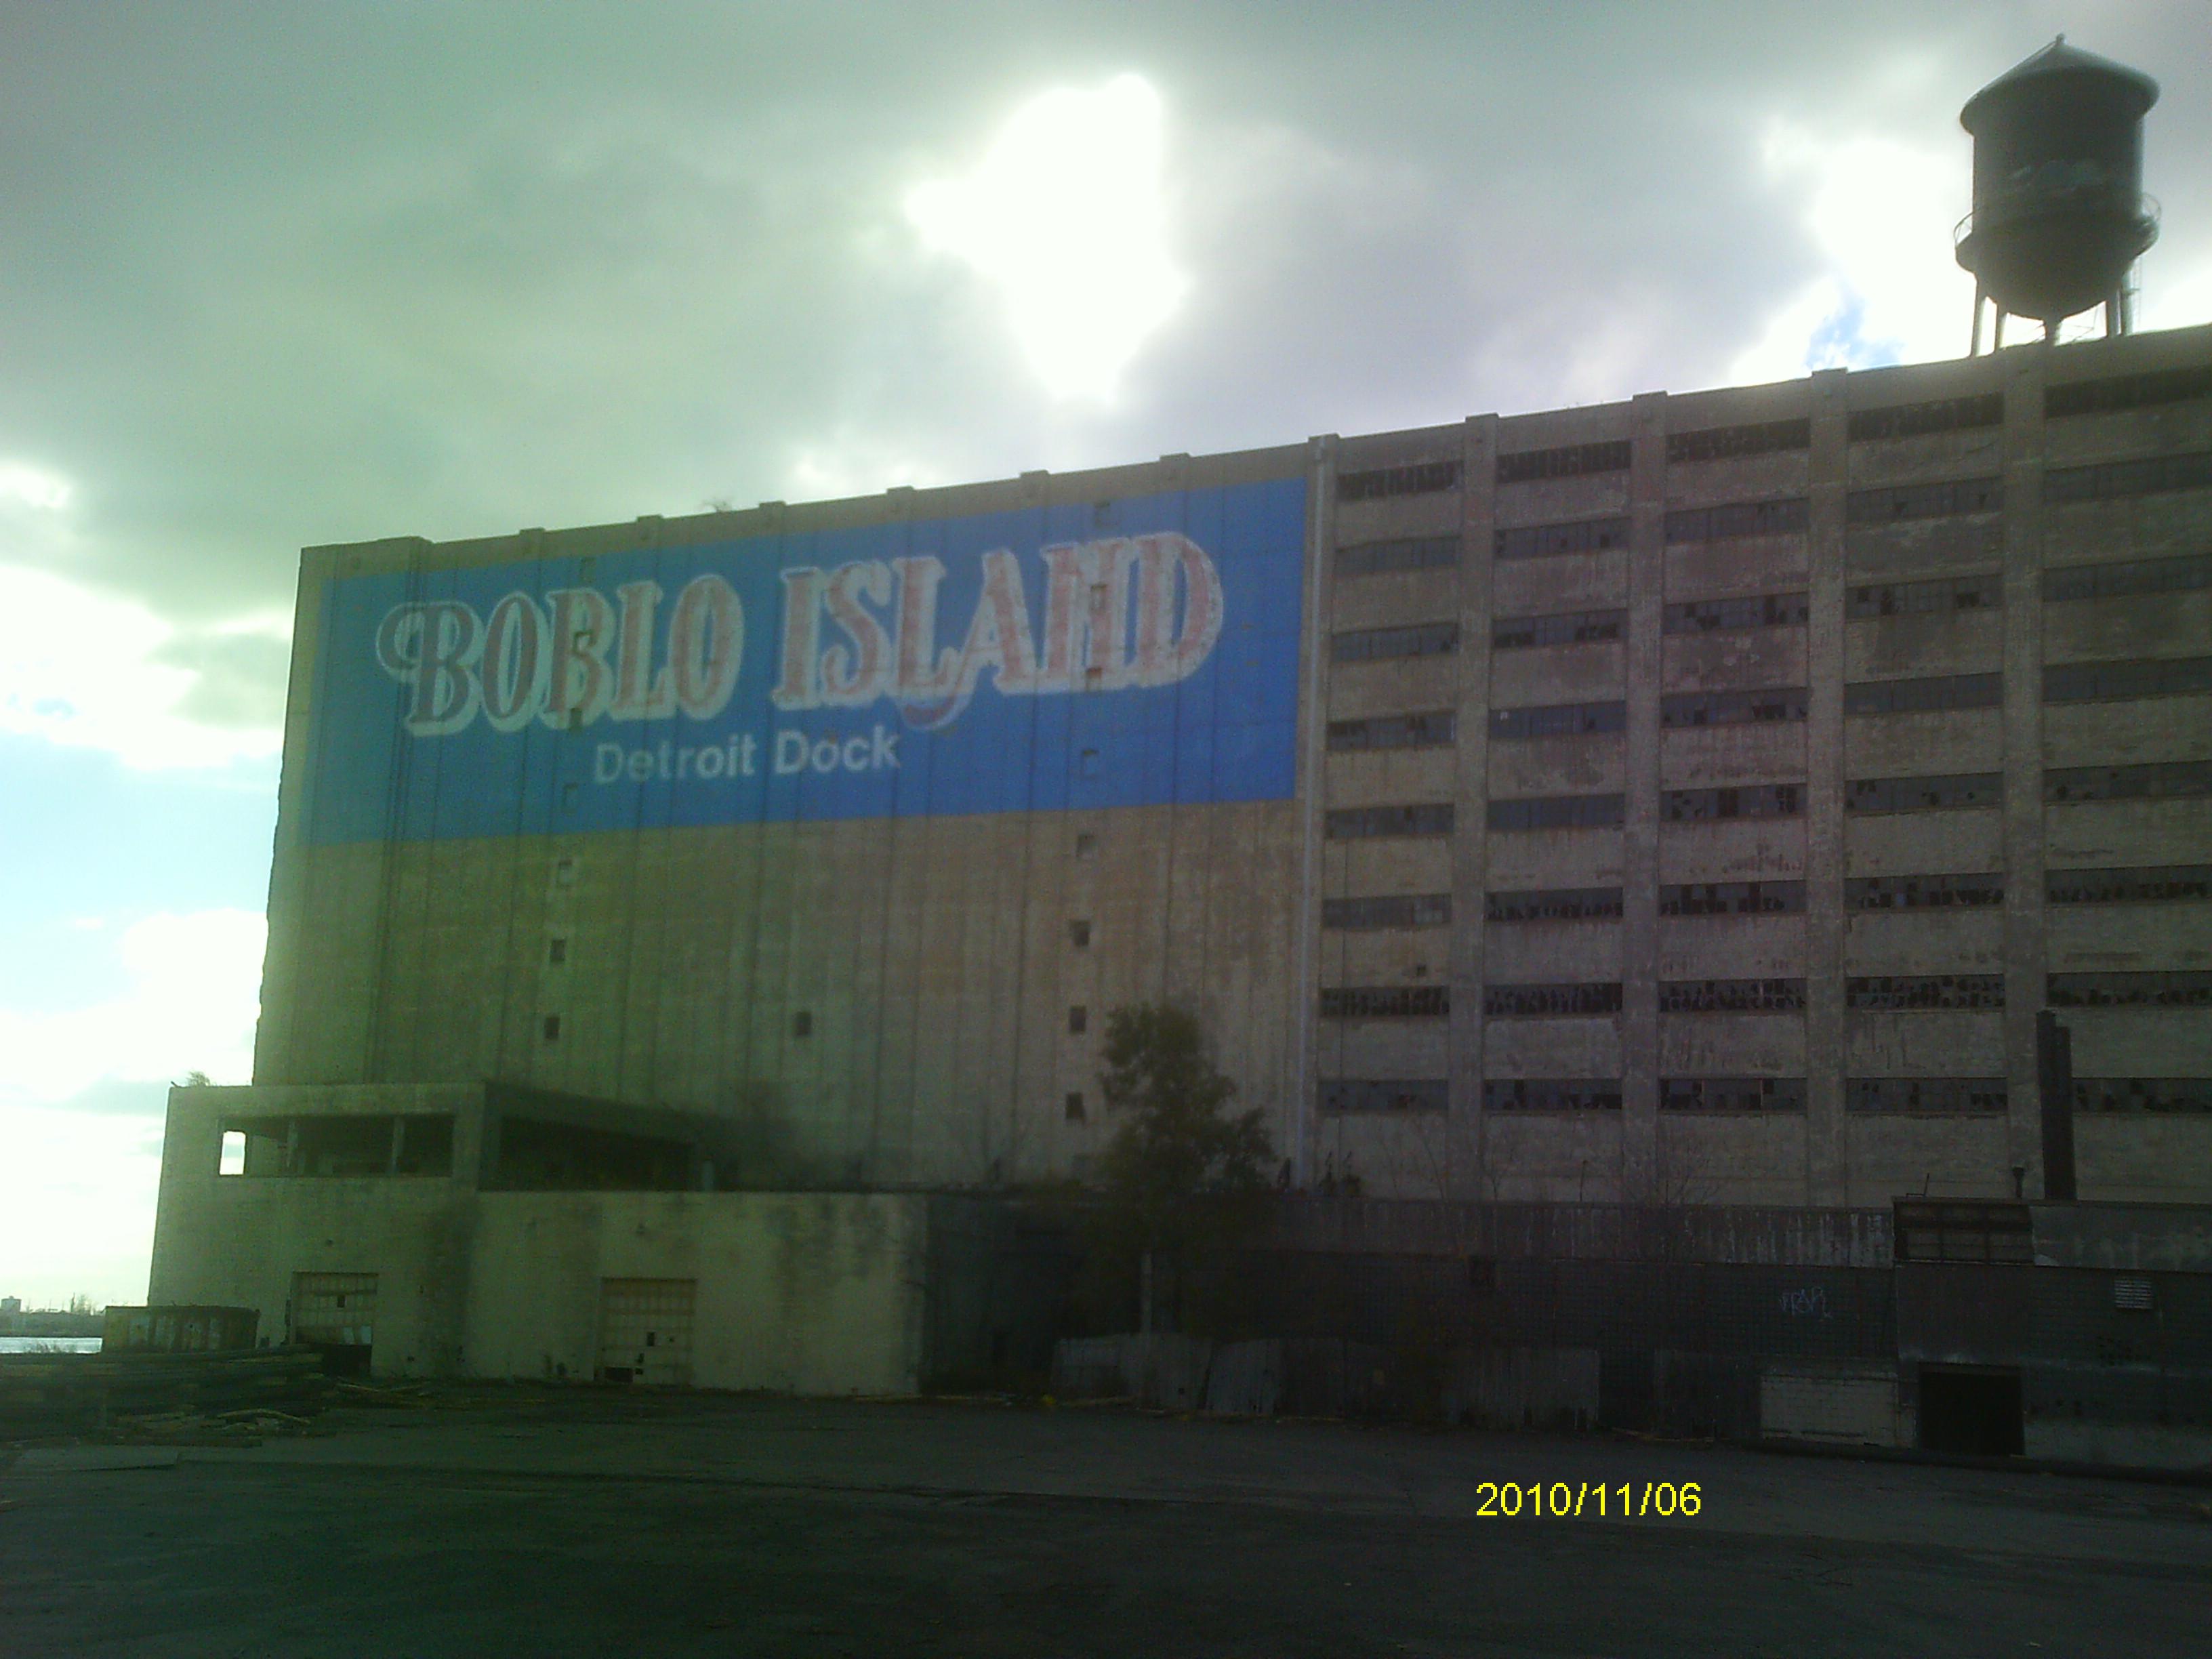 Boblo Island Amusement Park Michigan